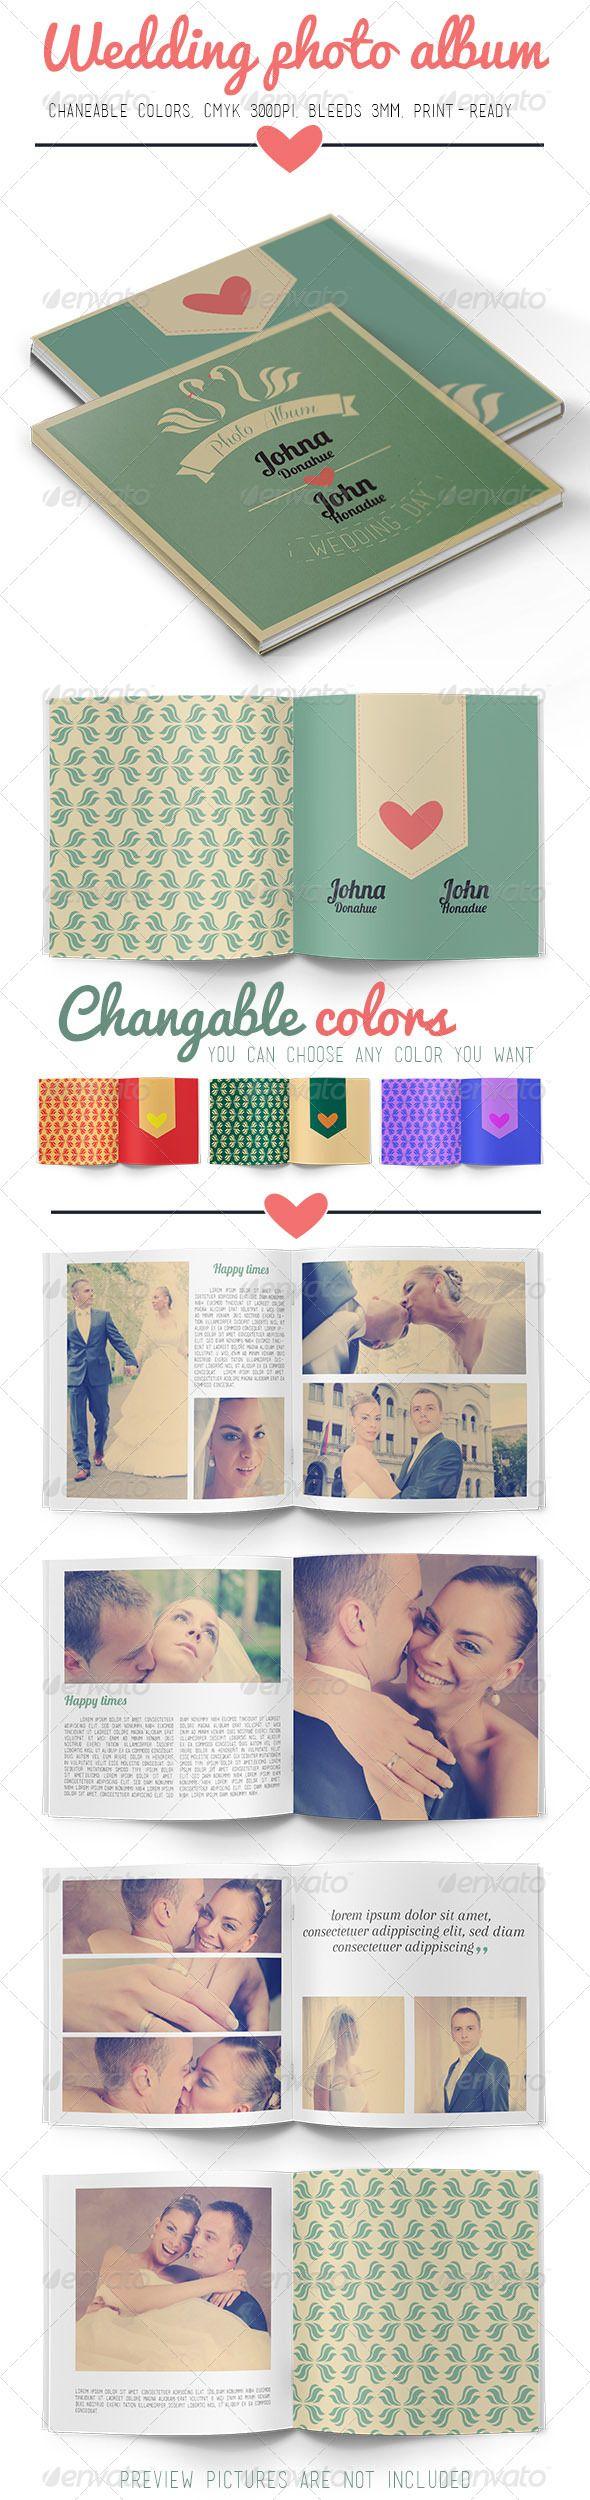 79 best fotobook images on Pinterest | Mini scrapbooks, Photograph ...